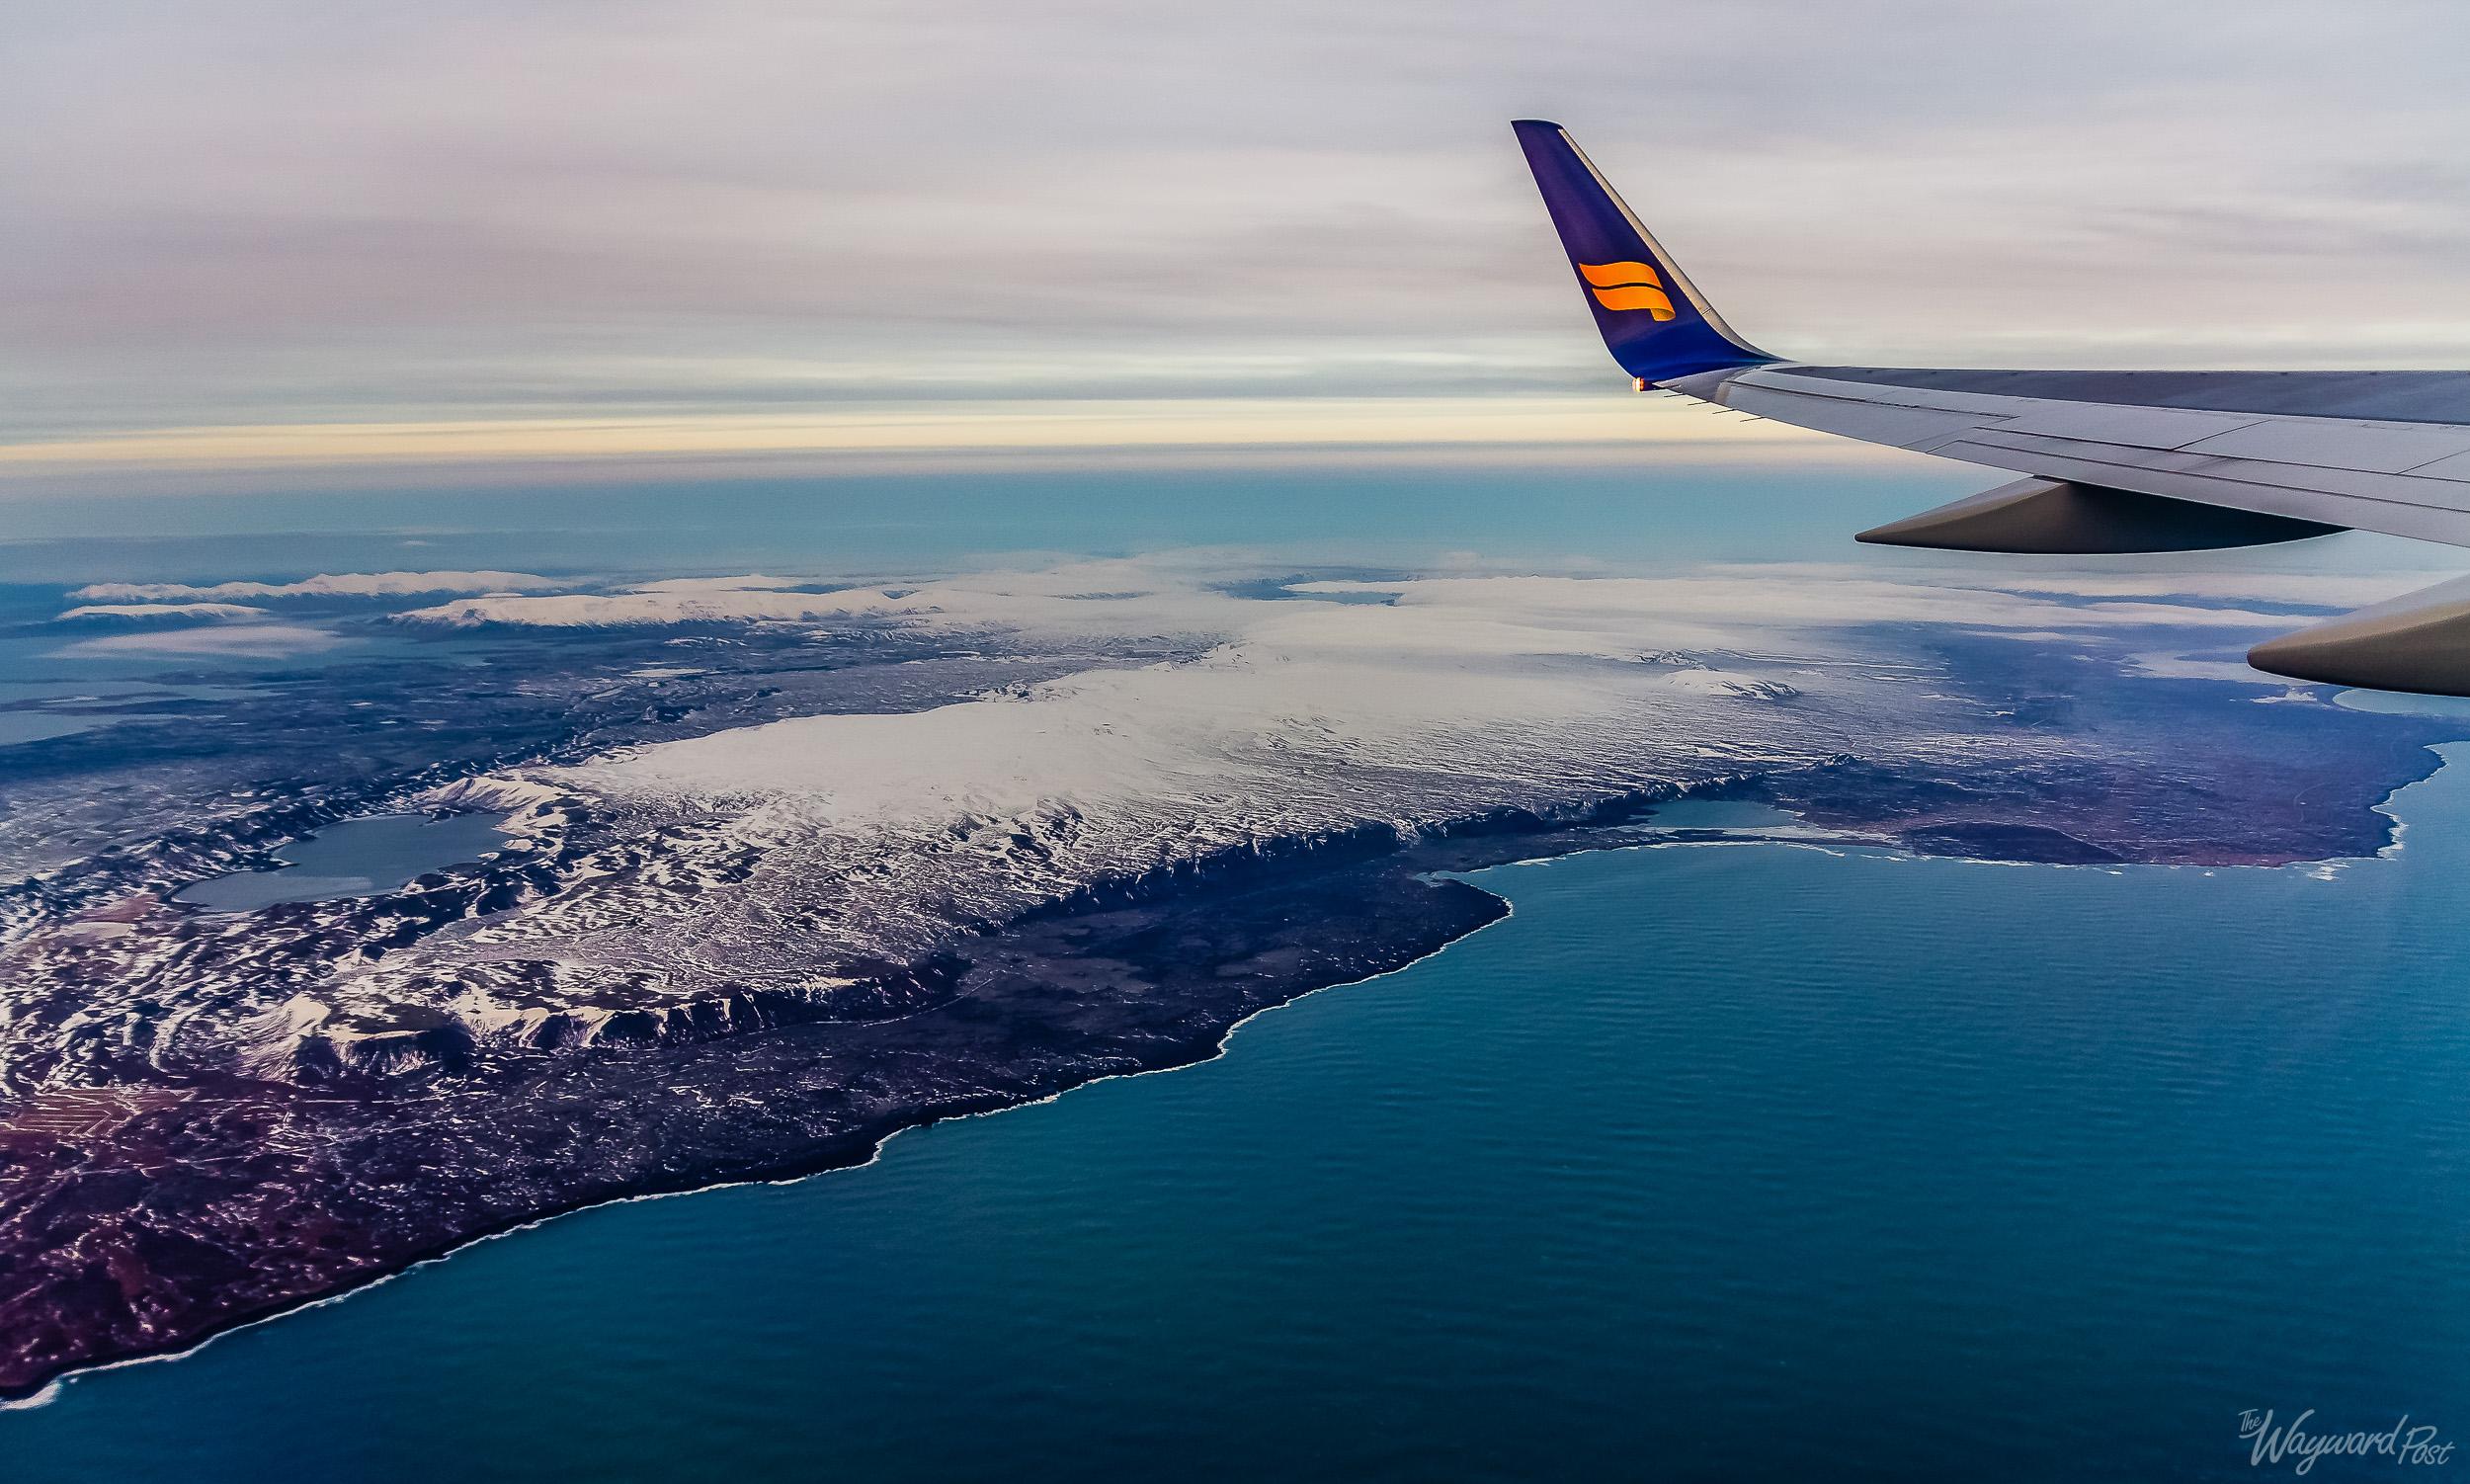 Plane, Airplane, Aeroplane, Wing, Iceland Air, Iceland, The Wayward Post